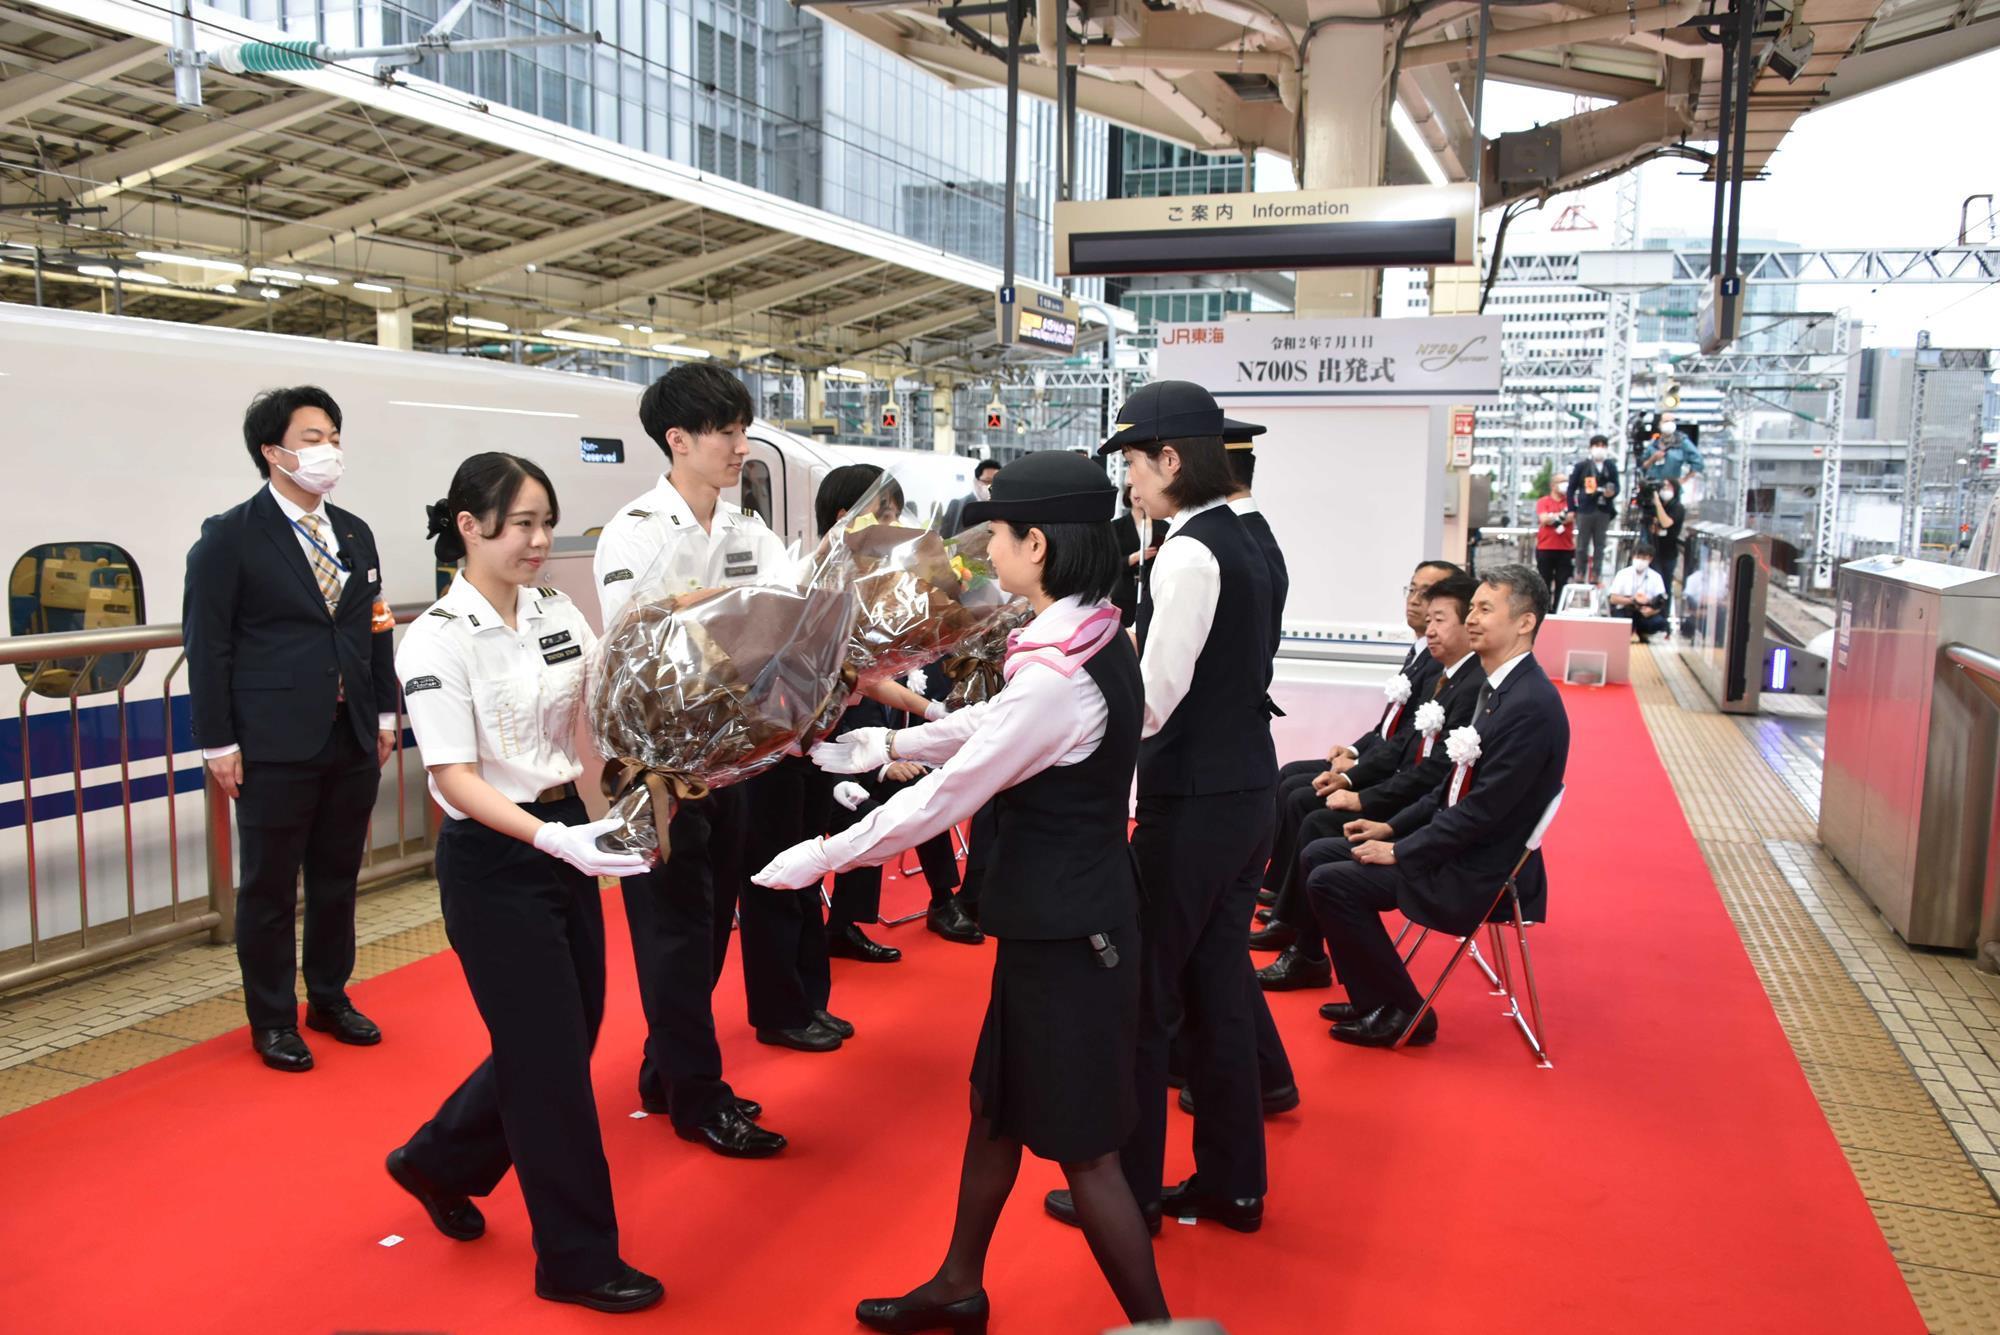 EcNYvk9VAAEMLrX?format=jpg&name=large - Shinkansen's new N700S begins service!